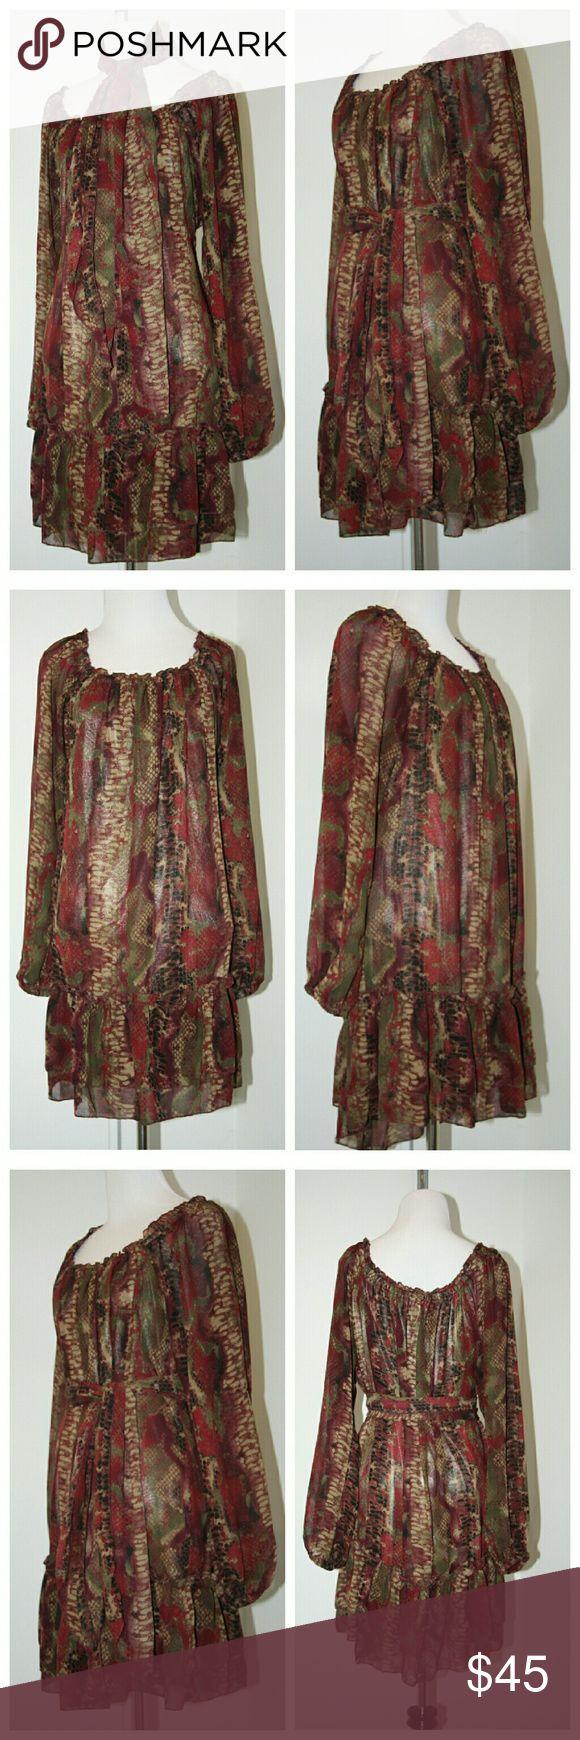 American Rag dress American Rag dress Size L EUC  Sheer sleeves Fully lined body American Rag Dresses Mini